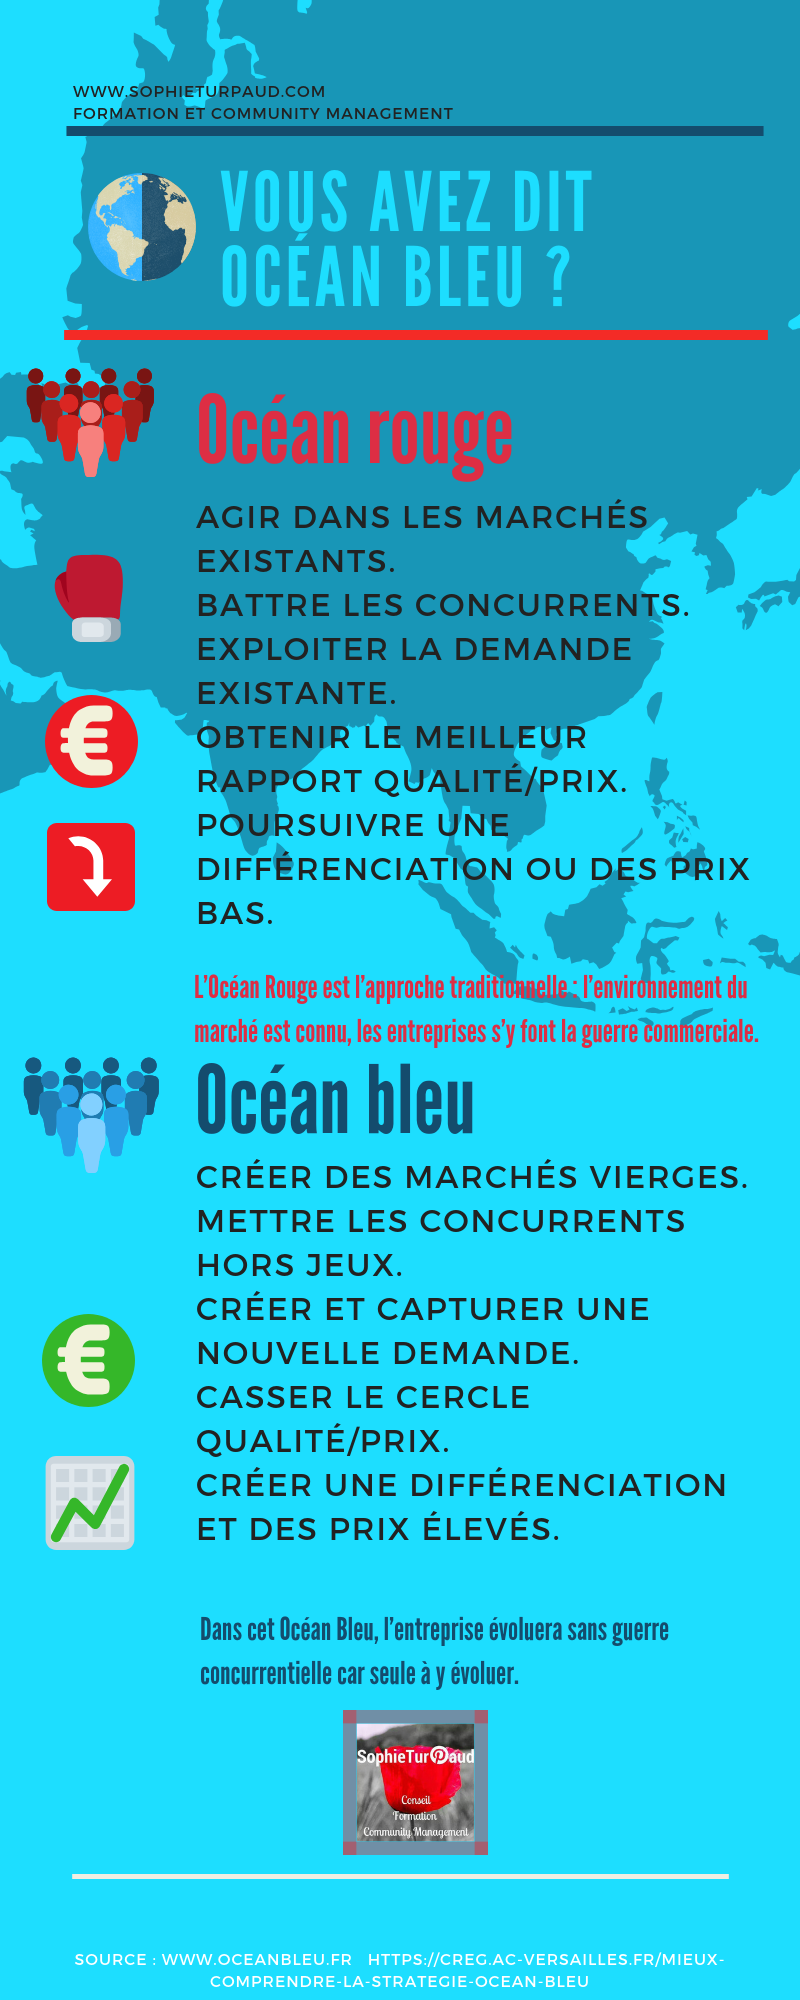 Stratégie Océan bleu vs Océan rouge via @sophieturpaud